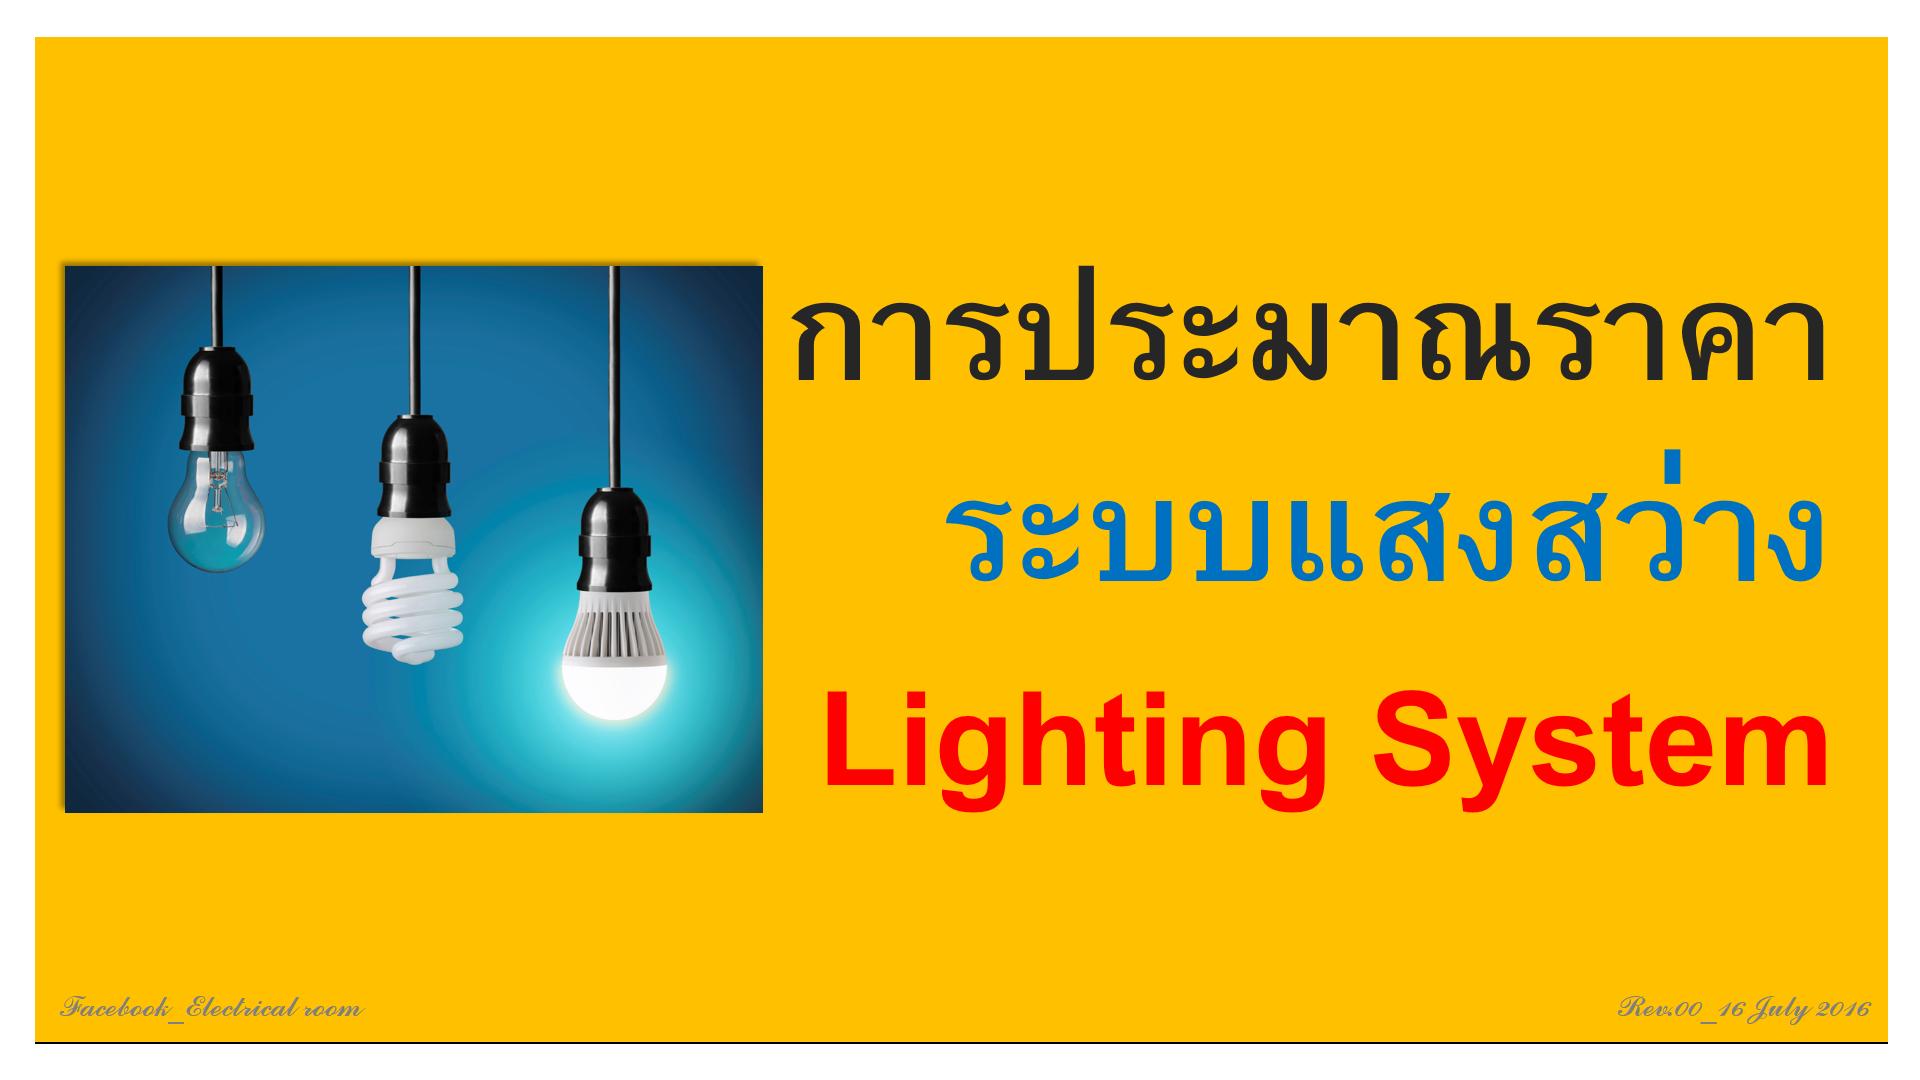 6.Lighting